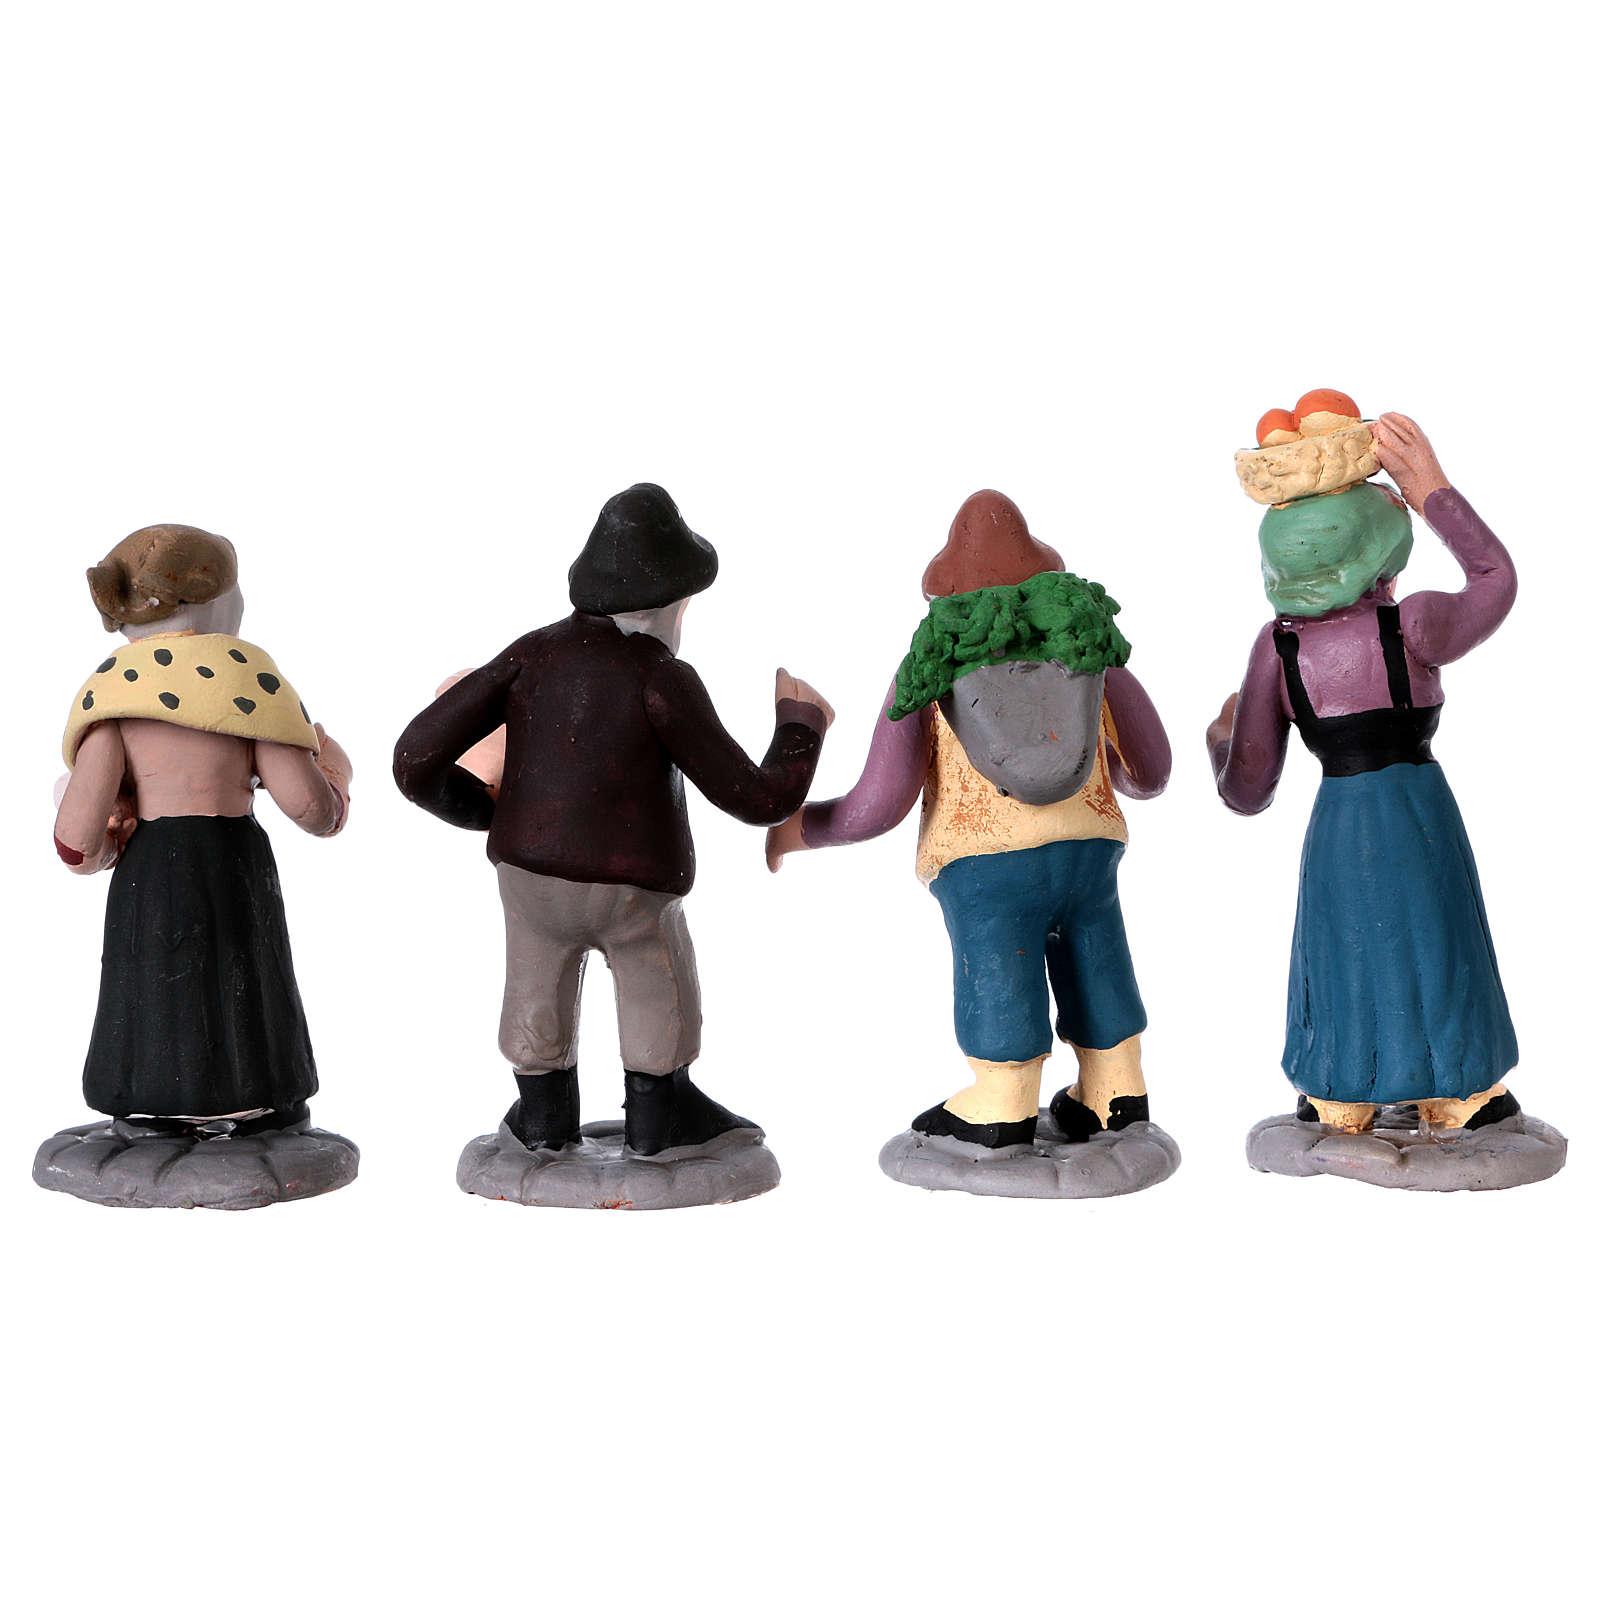 Nativity Scene figurines in terracotta real height 7 cm for Neapolitan Nativity Scene 36 pieces 4